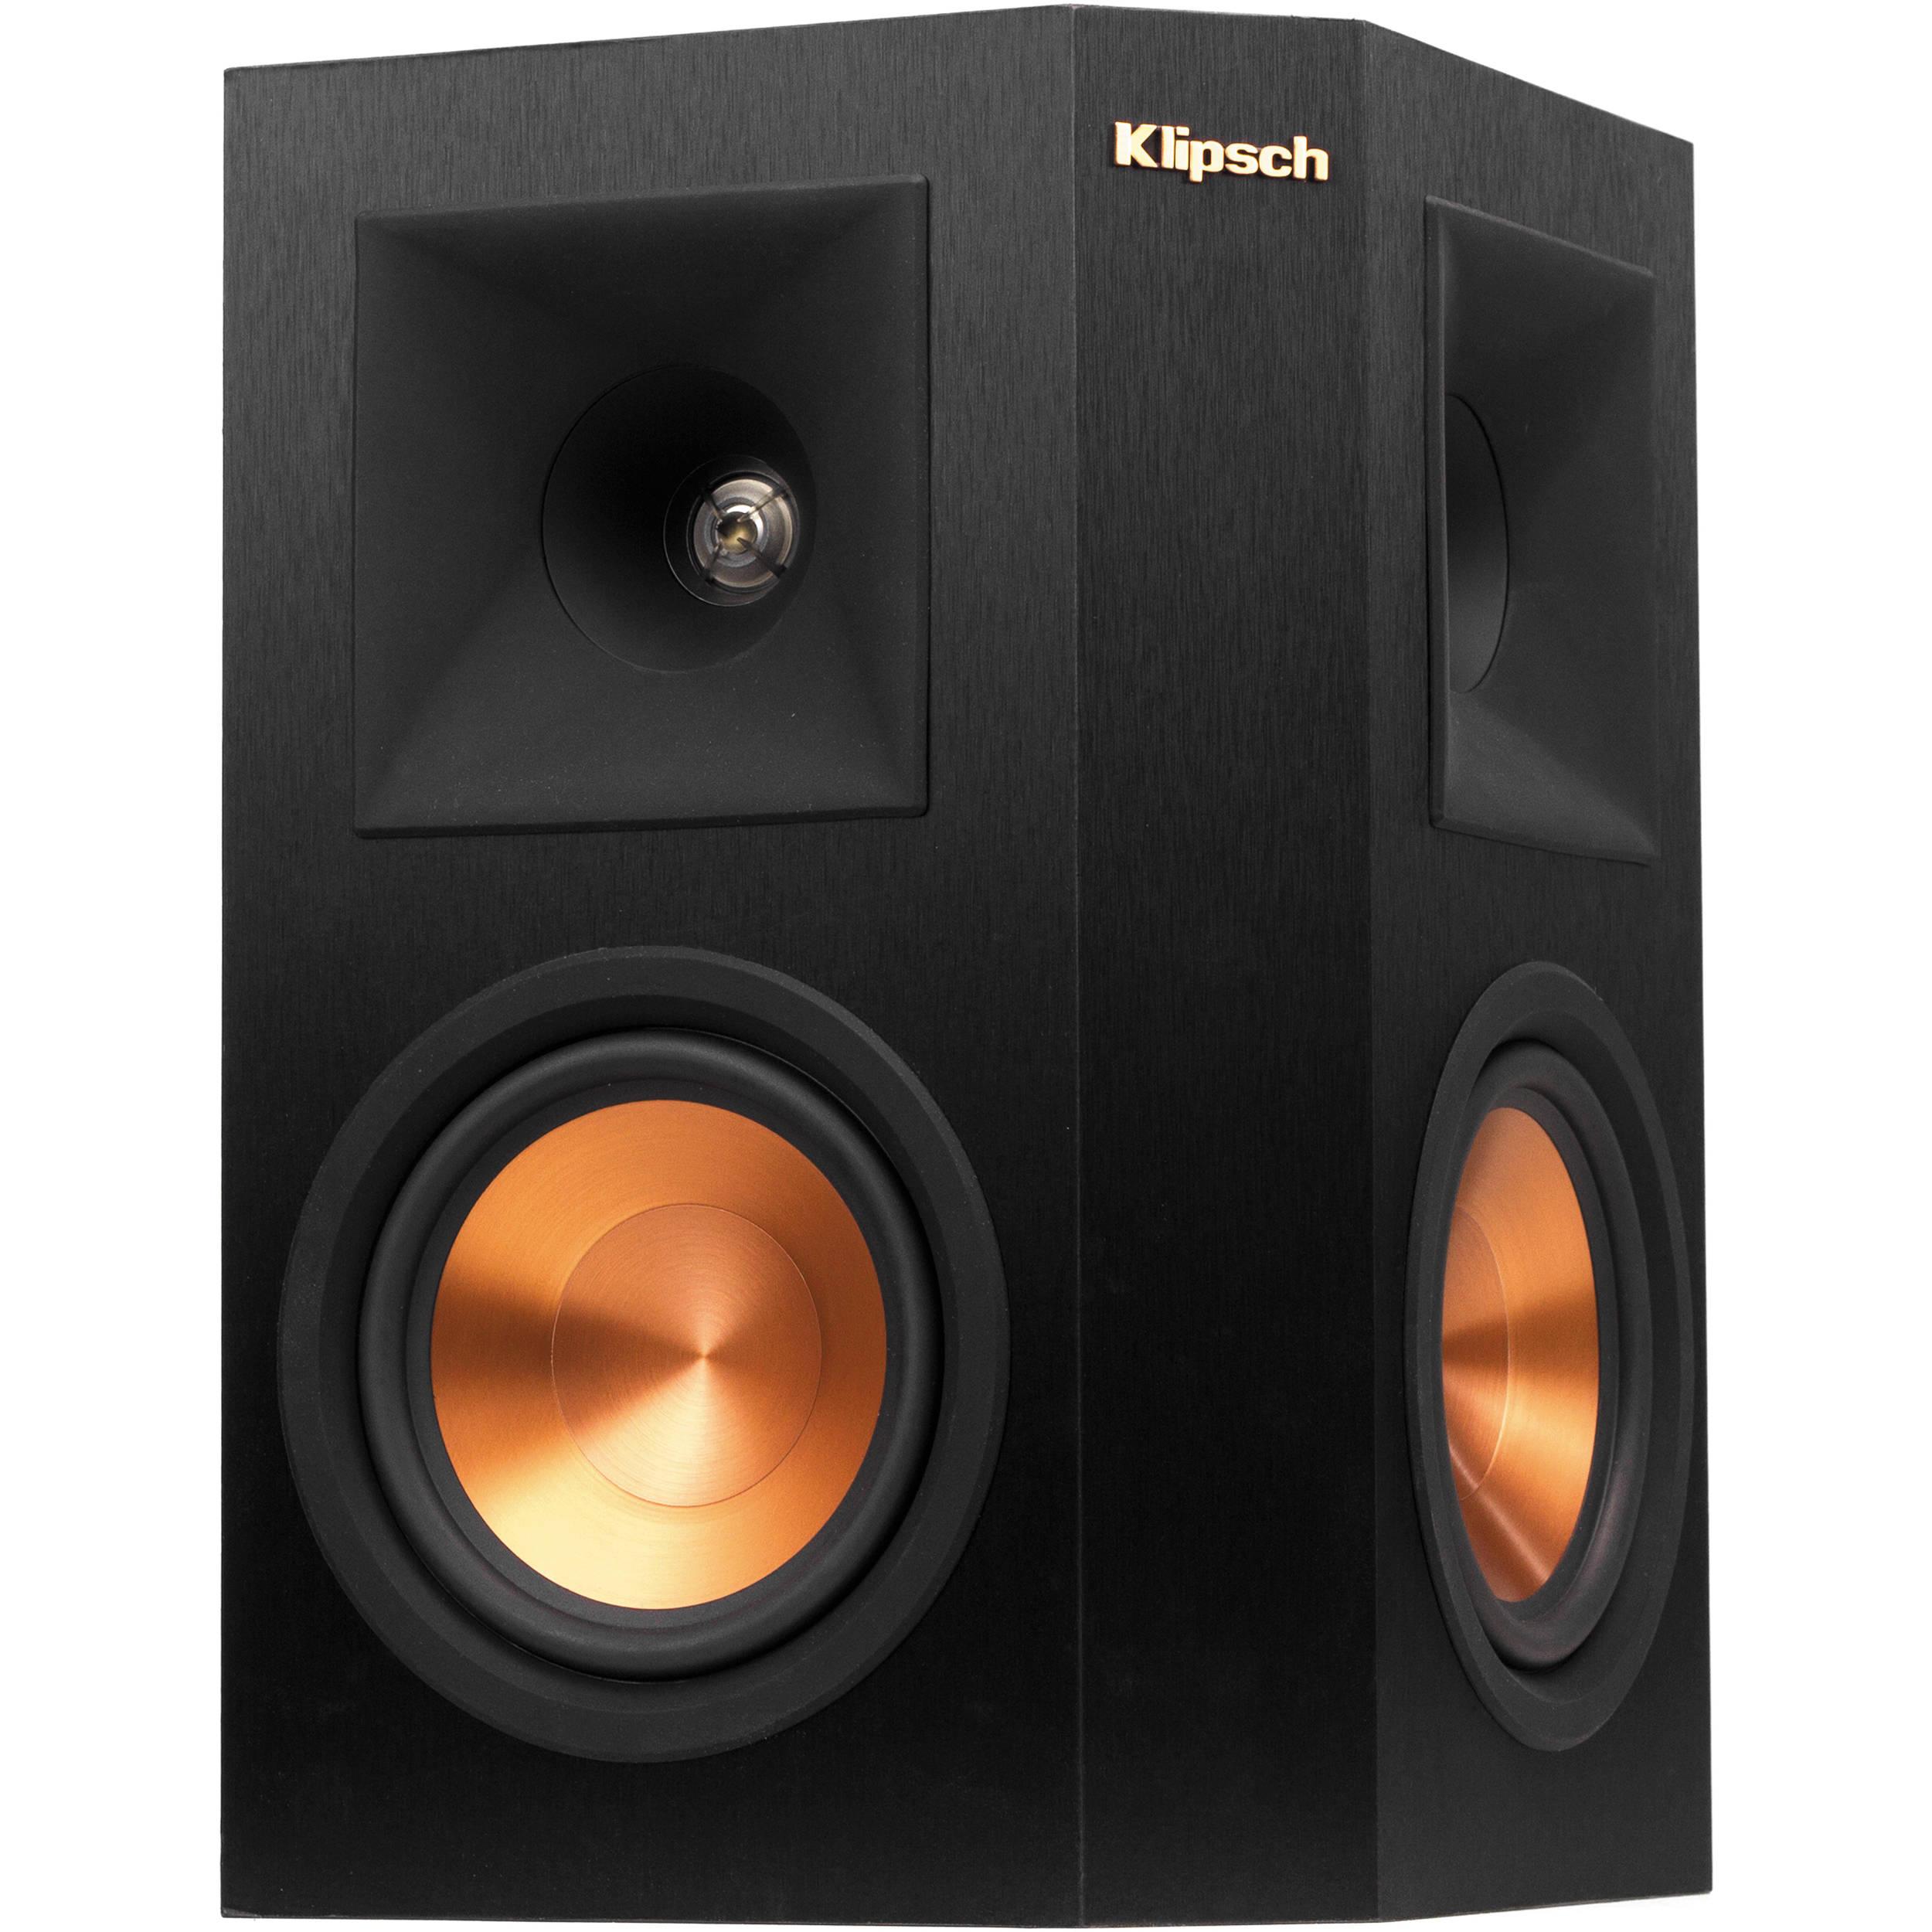 klipsch used speakers. klipsch reference premiere rp-250s surround speaker (black, single) used speakers